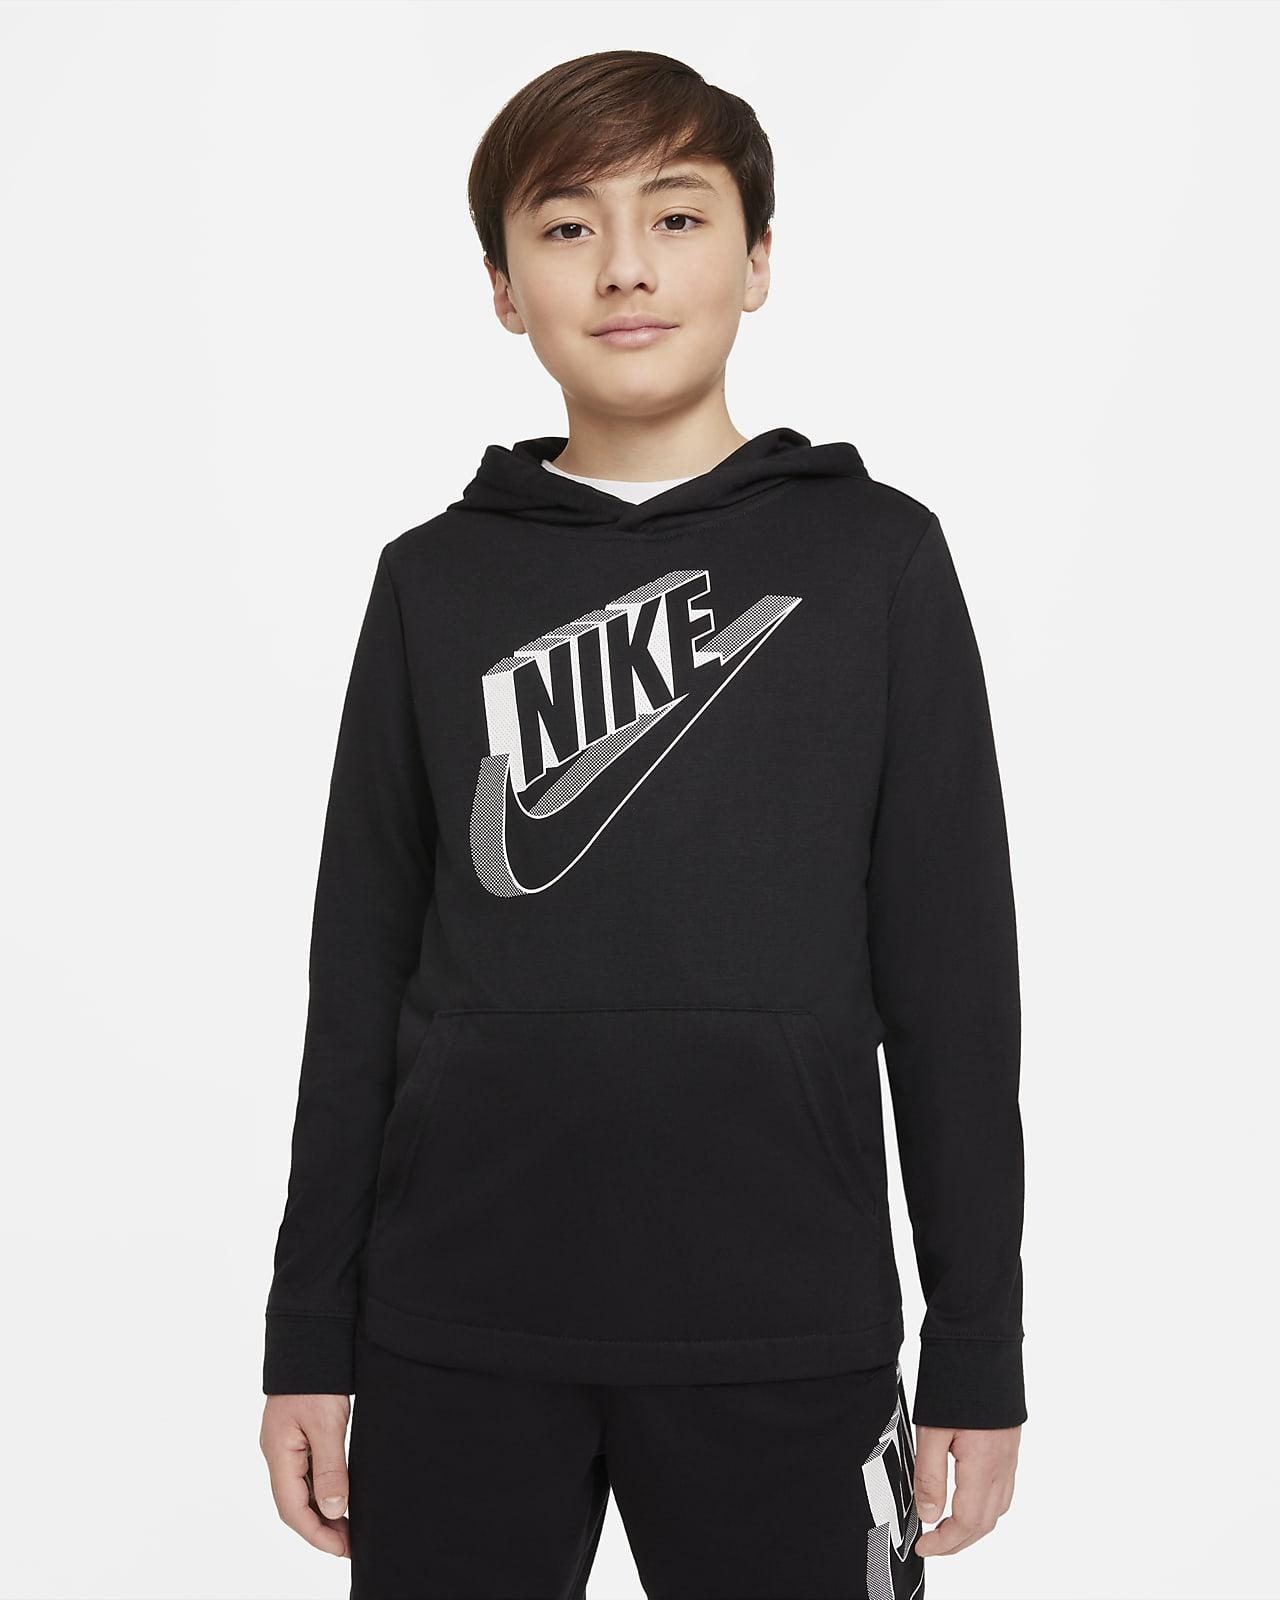 Sudadera con gorro para niño talla grande Nike Sportswear